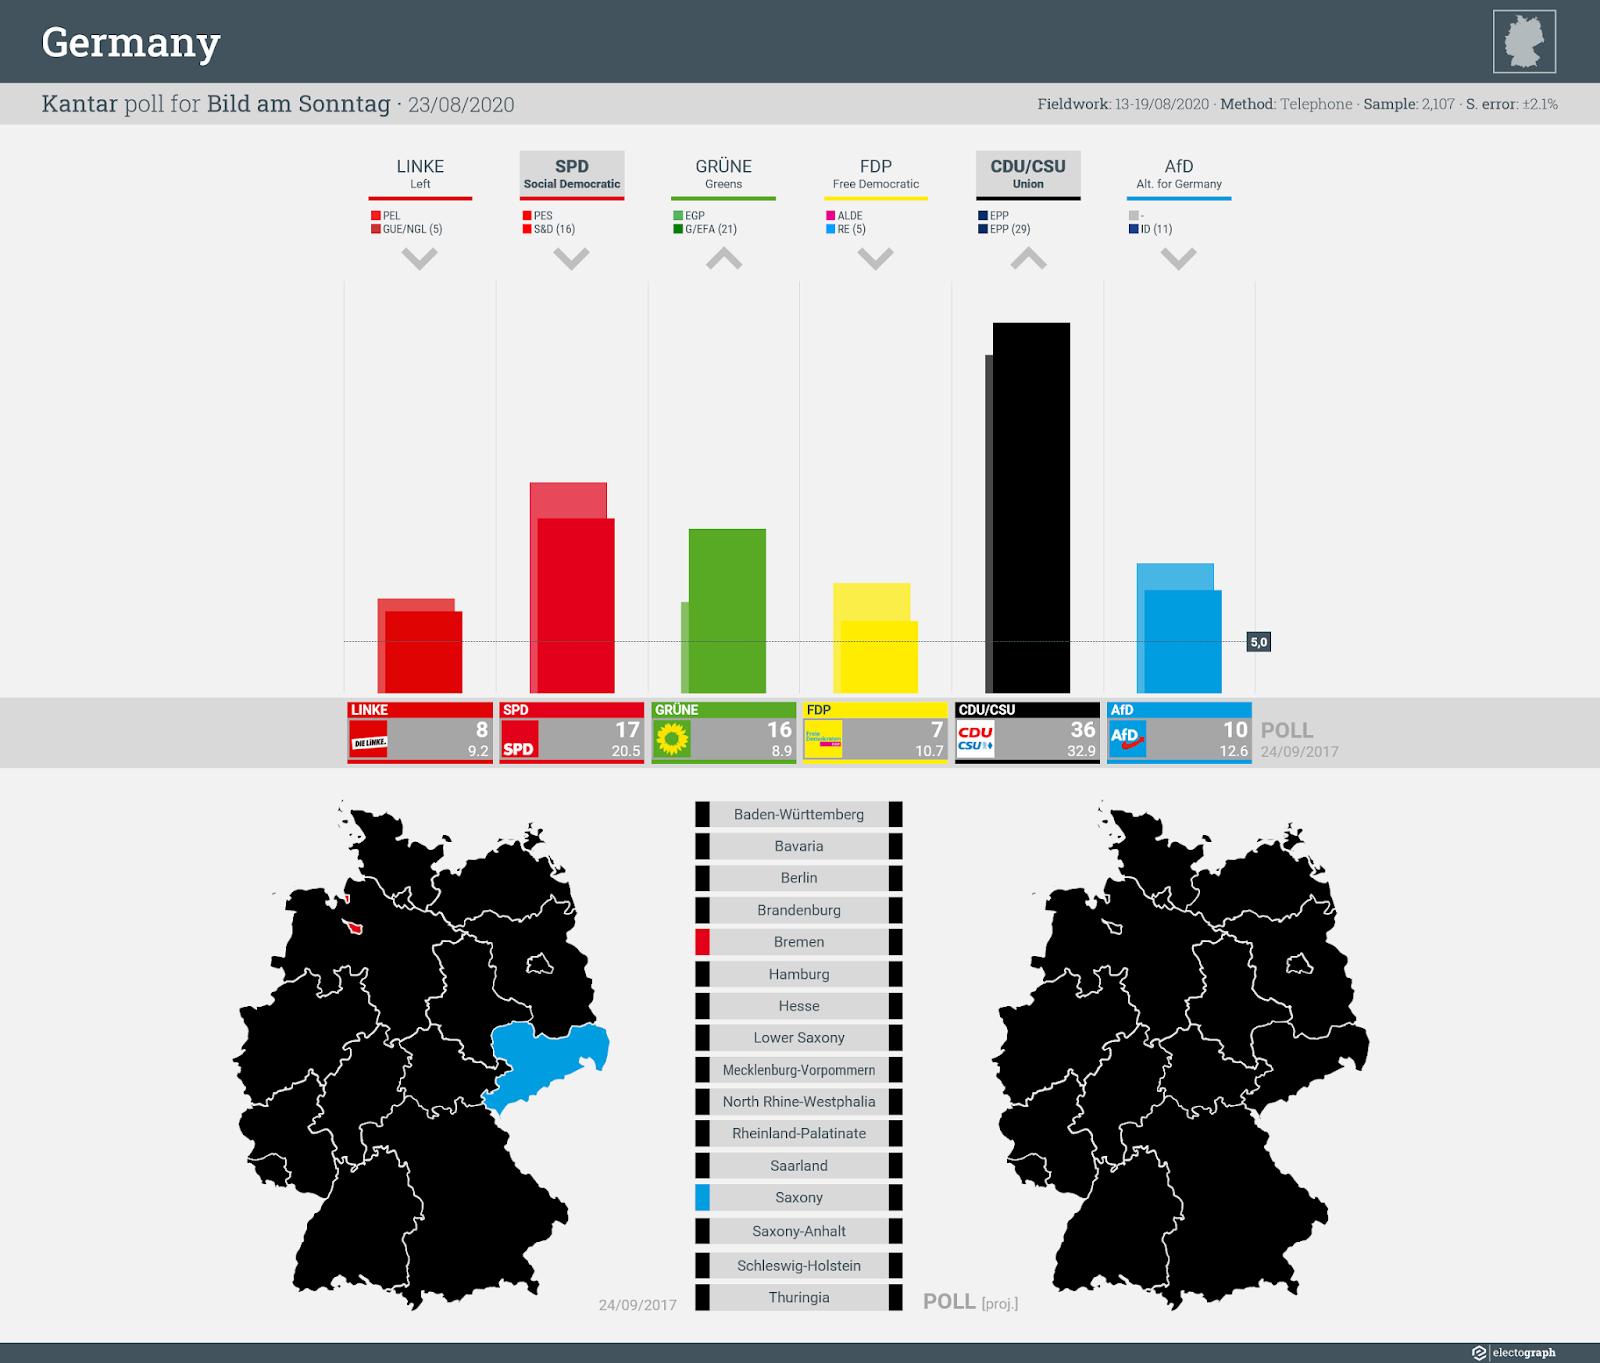 GERMANY: Kantar poll chart for Bild am Sonntag, 23 August 2020